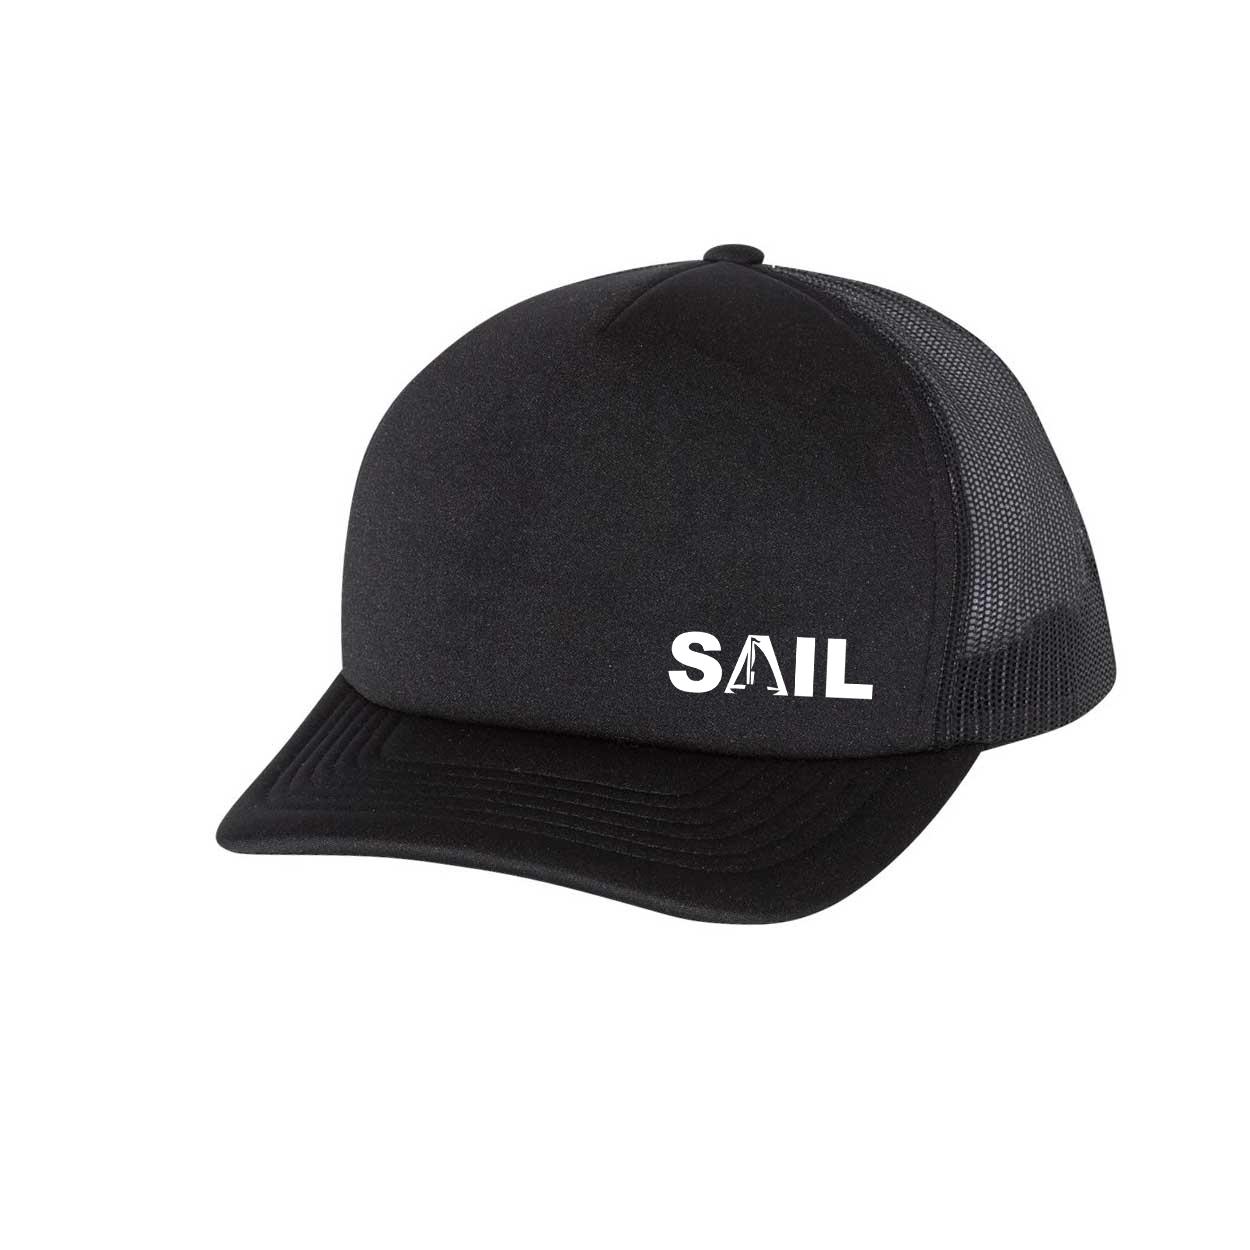 Sail Boat Logo Night Out Premium Foam Trucker Snapback Hat Black (White Logo)